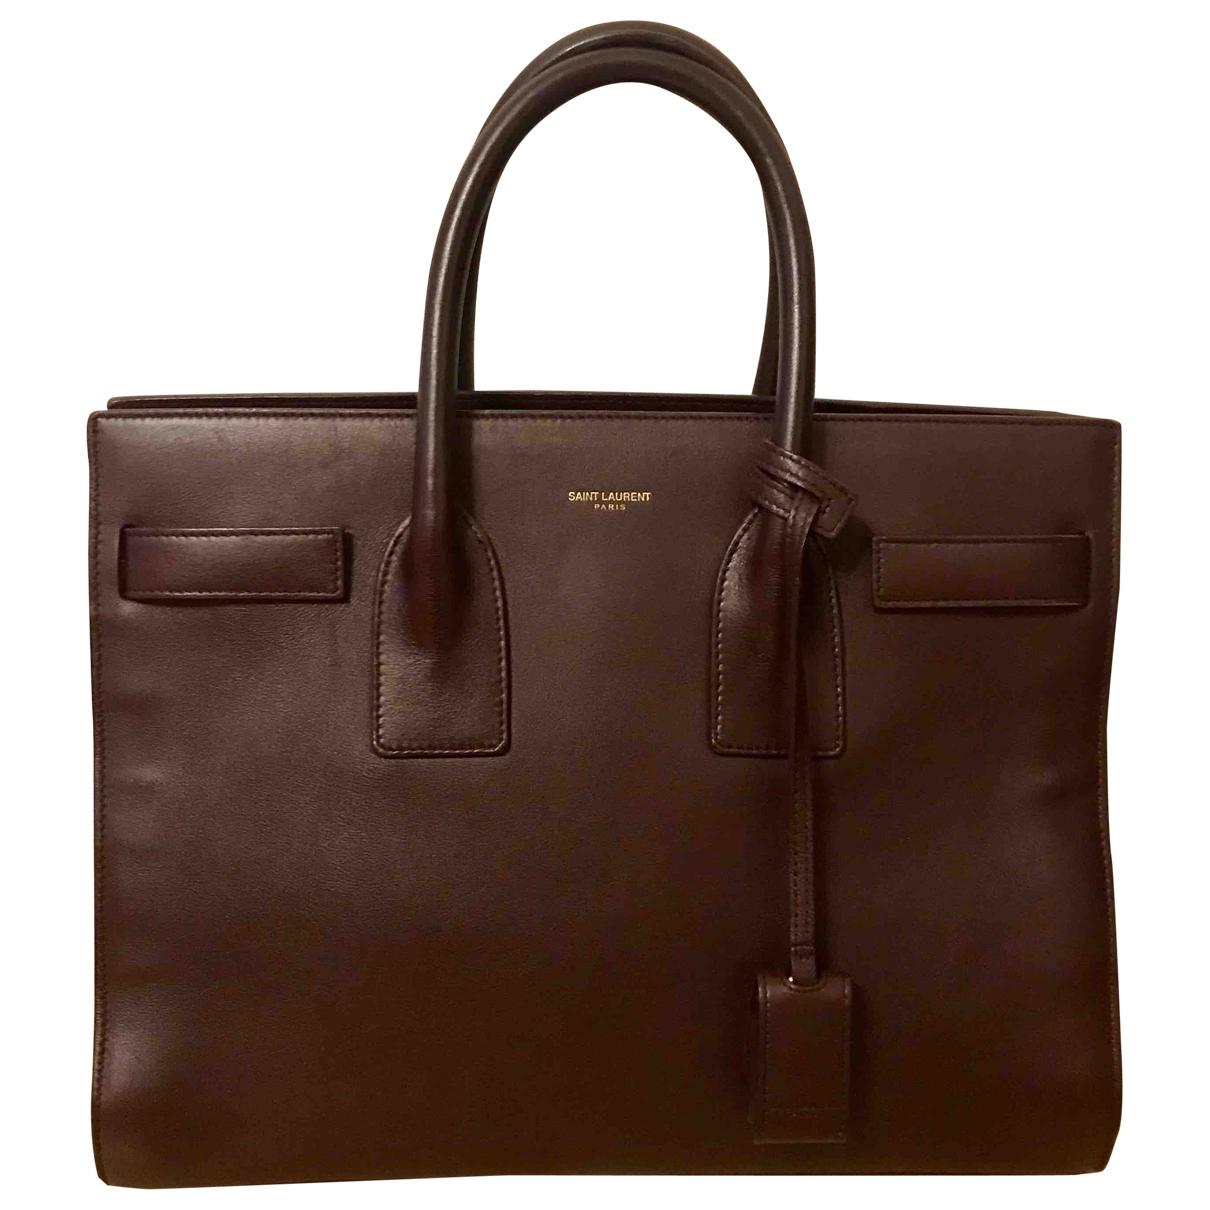 Saint Laurent Sac de Jour Red Leather handbag for Women \N